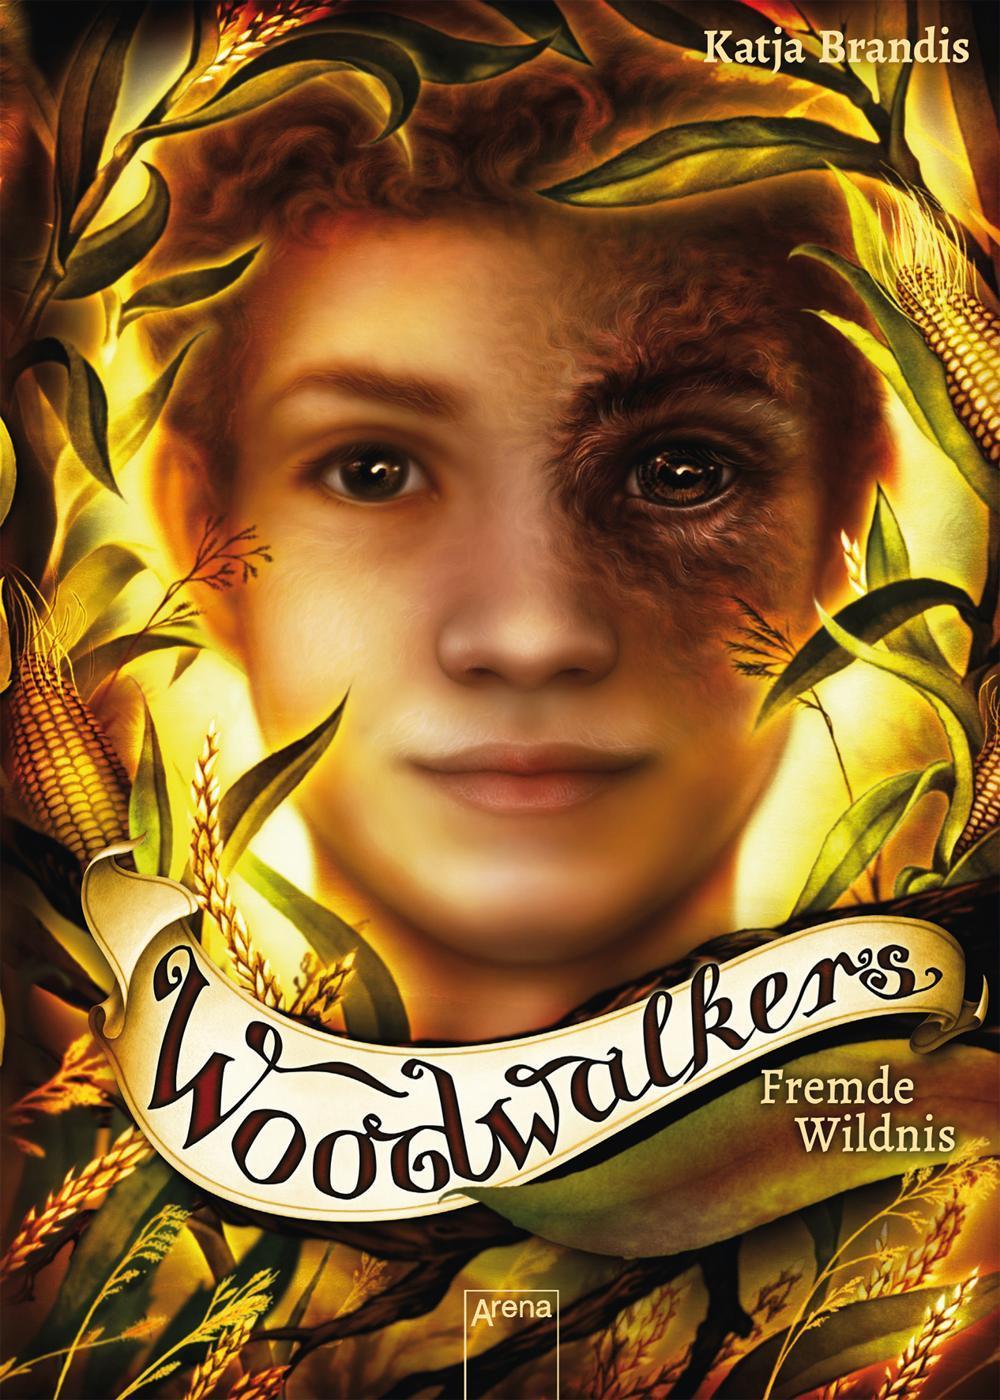 Woodwalkers Fremde Wildnis